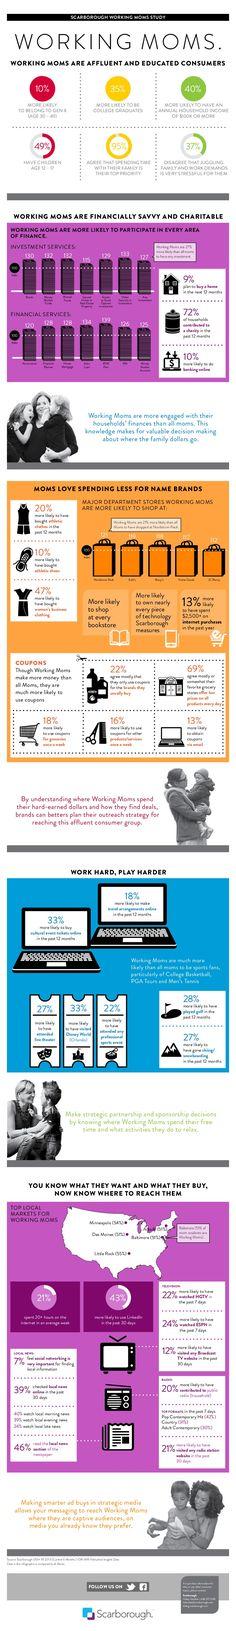 Working Moms   #infographic #WorkingMoms #Business